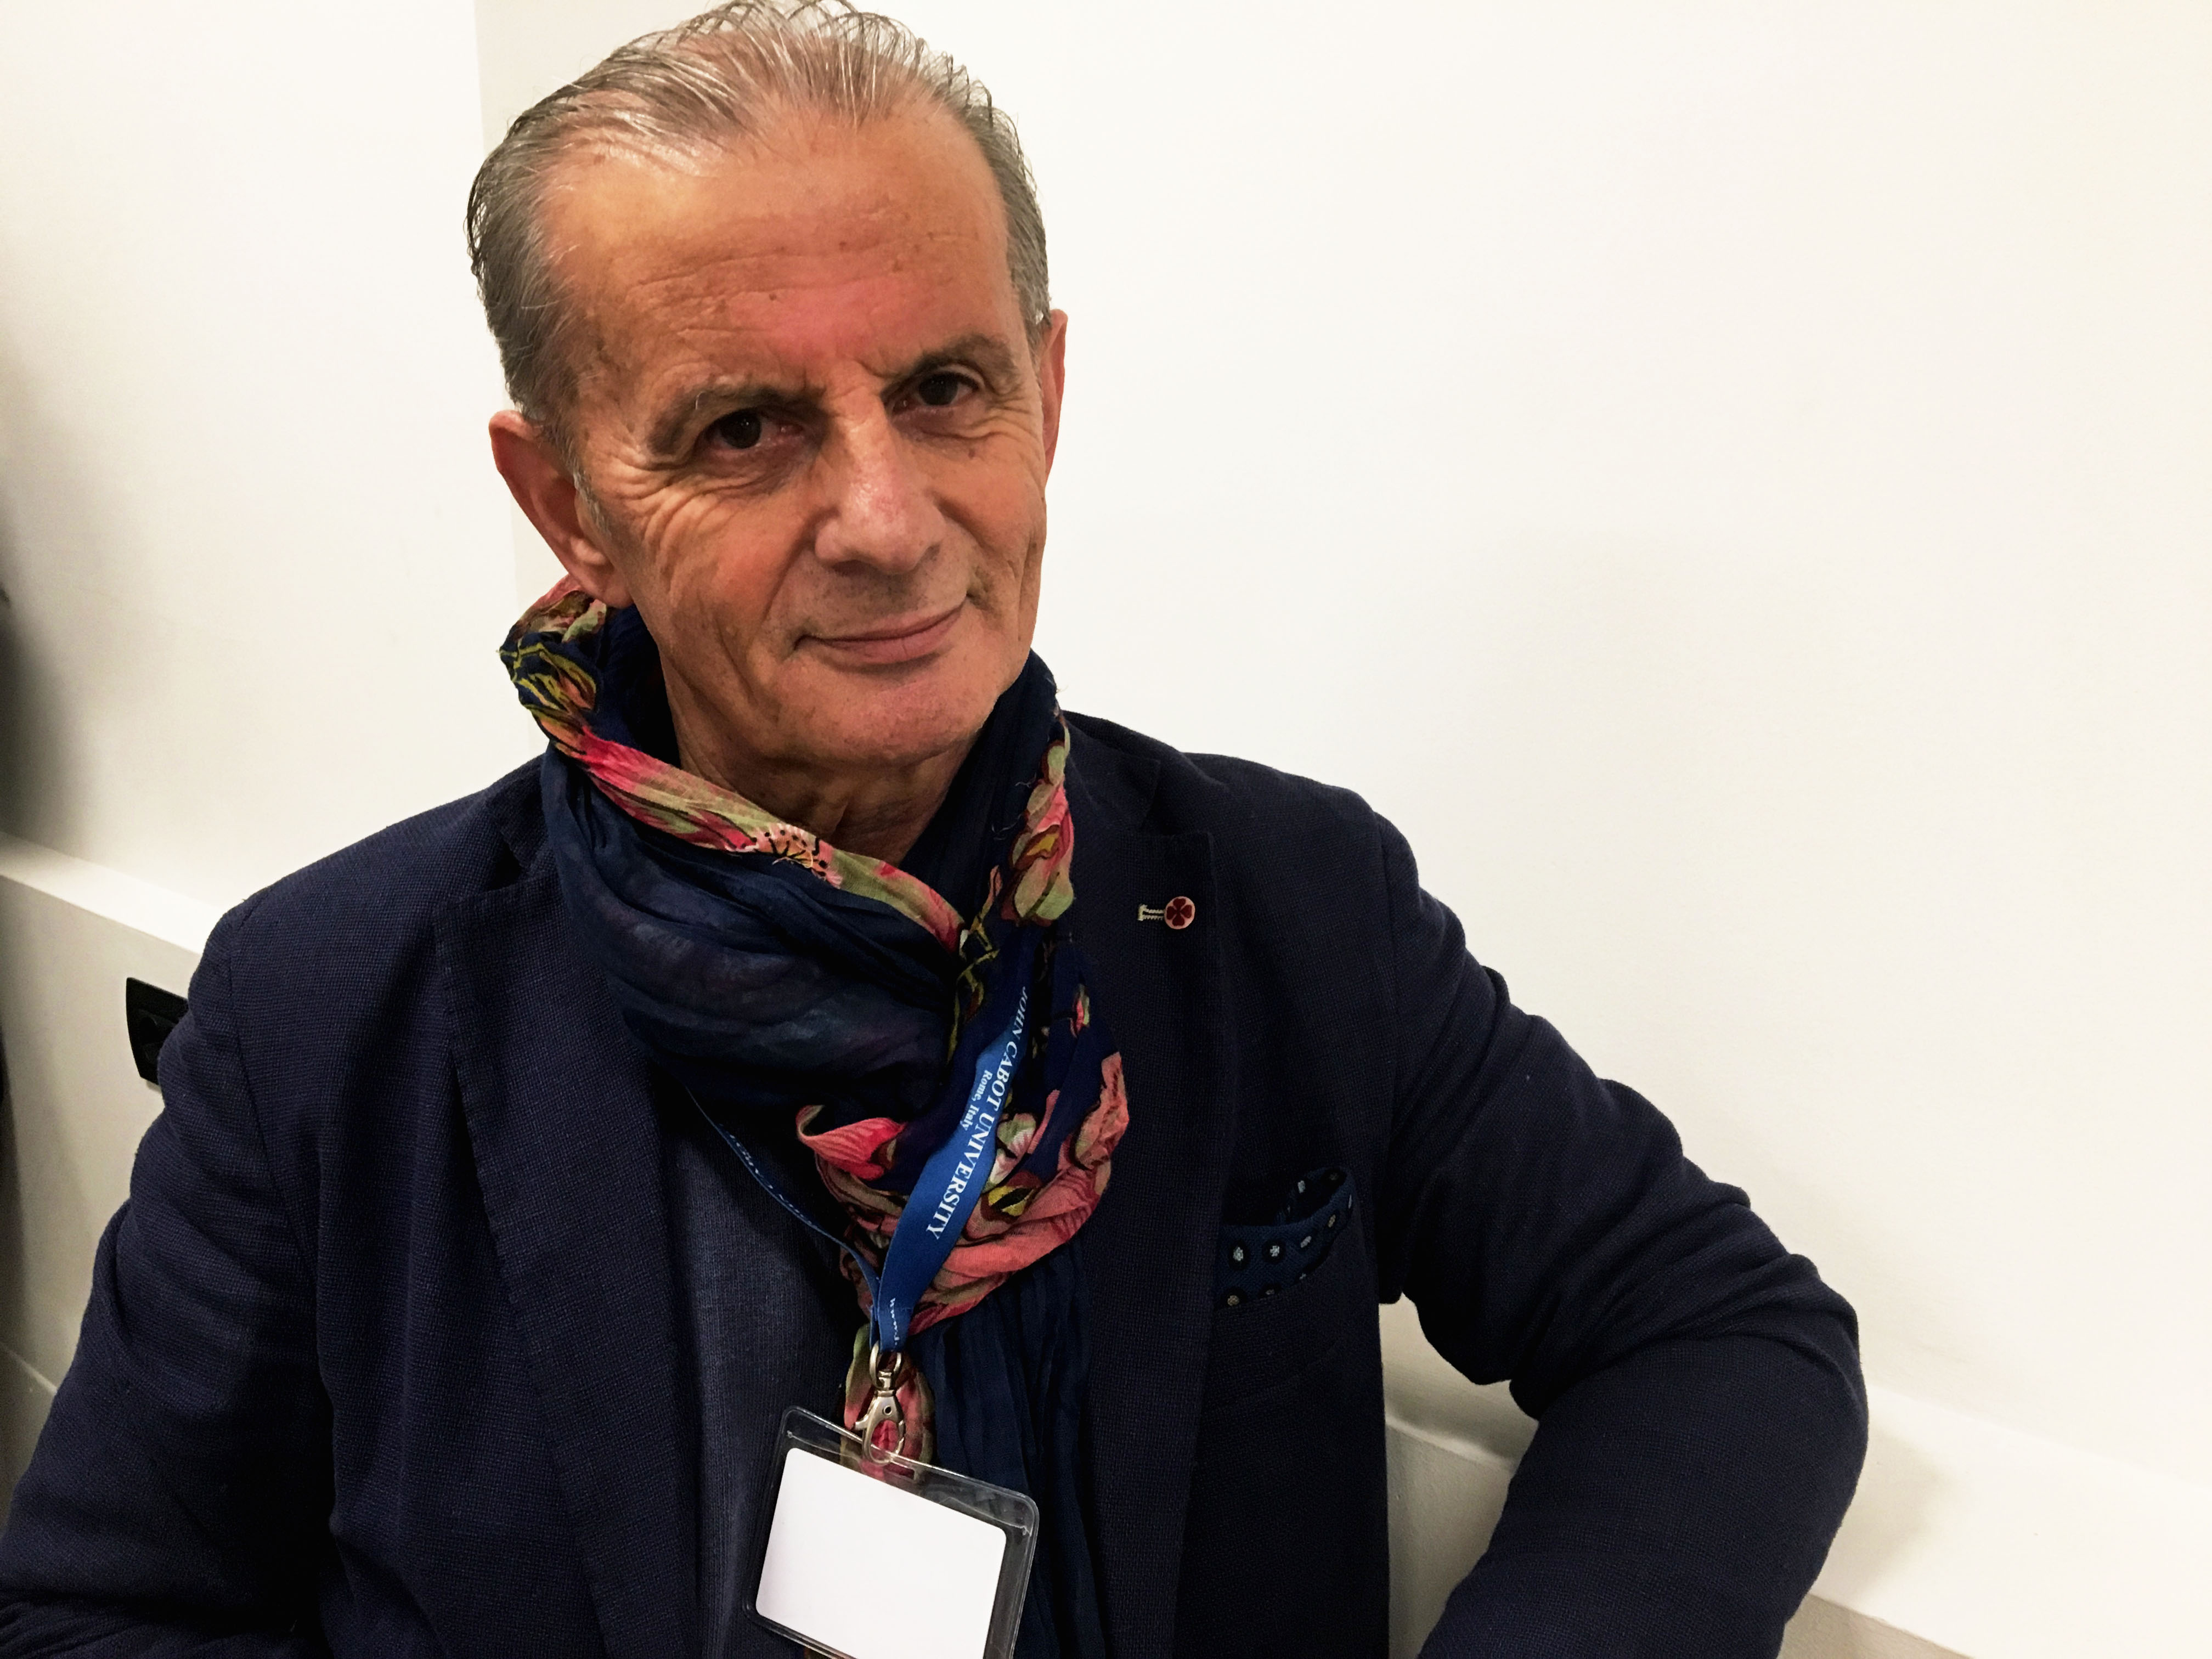 Giovanni Izzo